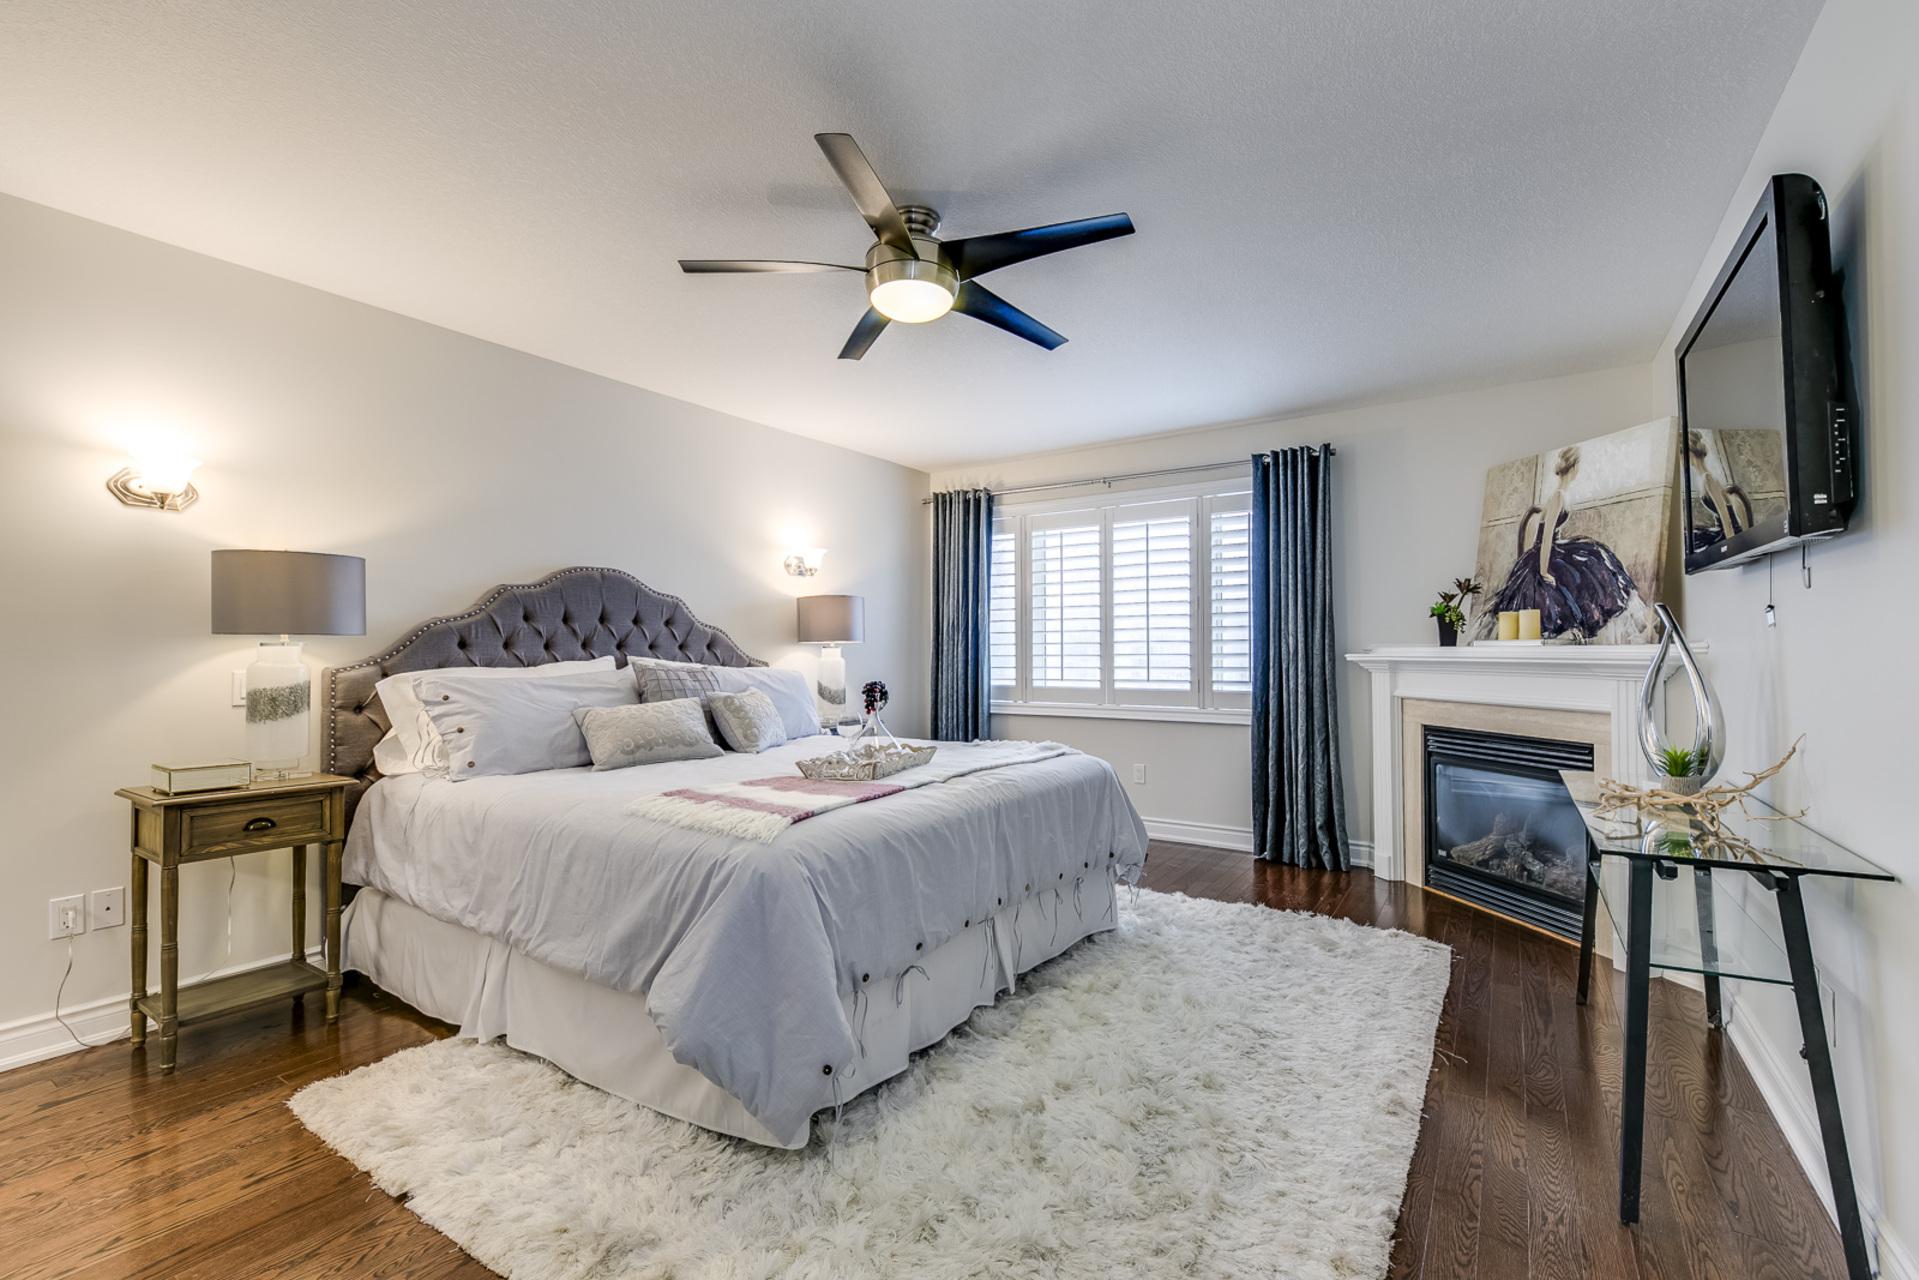 Master Bedroom - 2473 Tesla Cres, Oakville - Elite3 & Team at 2473 Tesla Crescent, Iroquois Ridge North, Oakville